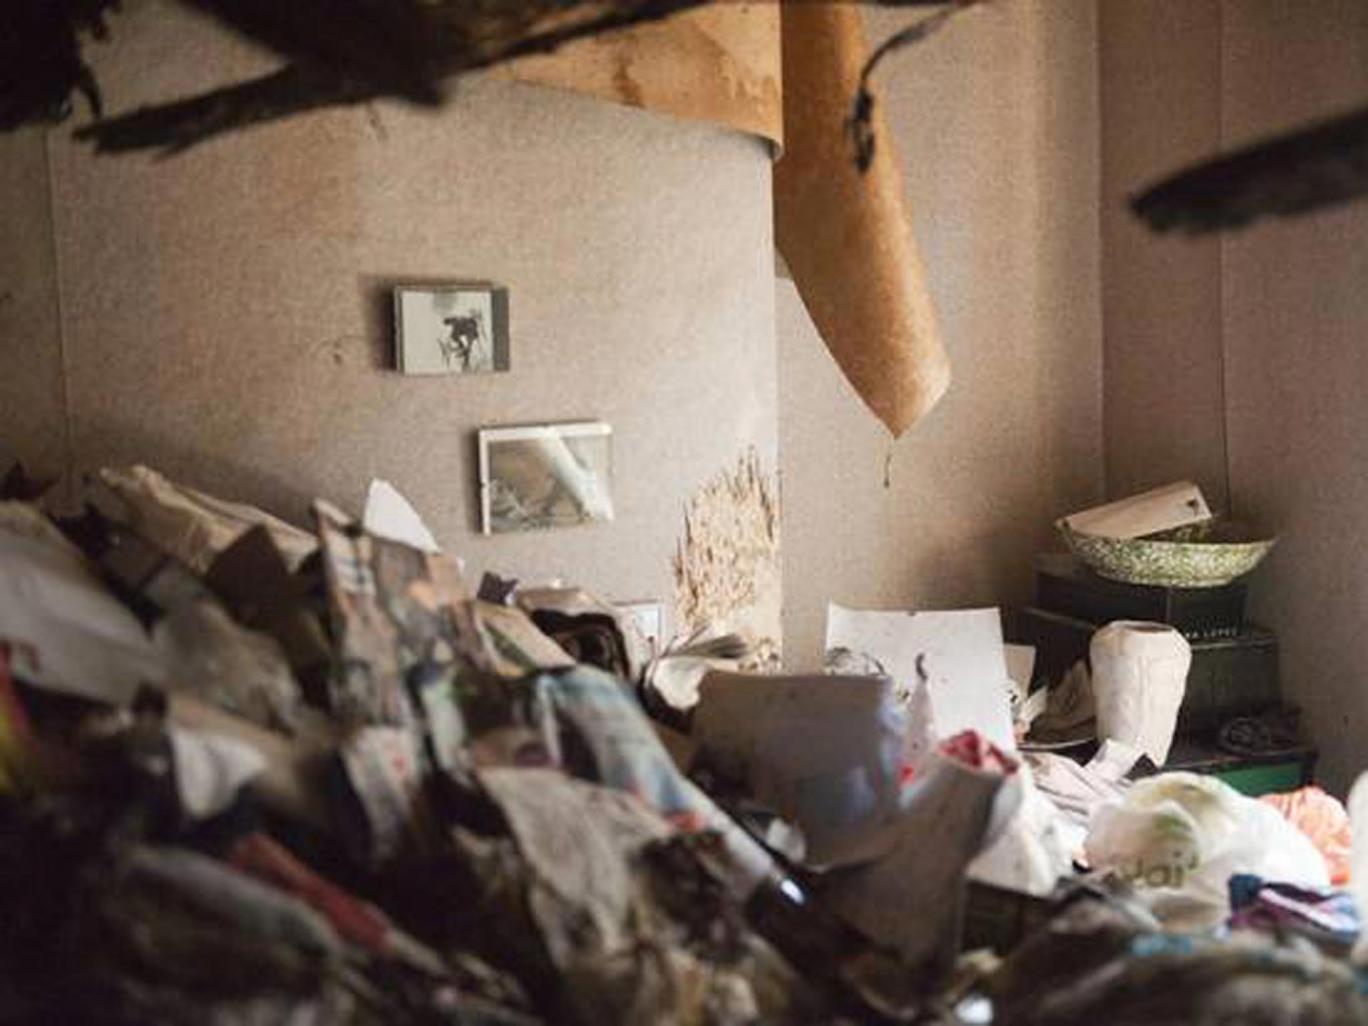 Inside the home, Glenn Copus/Evening Standard